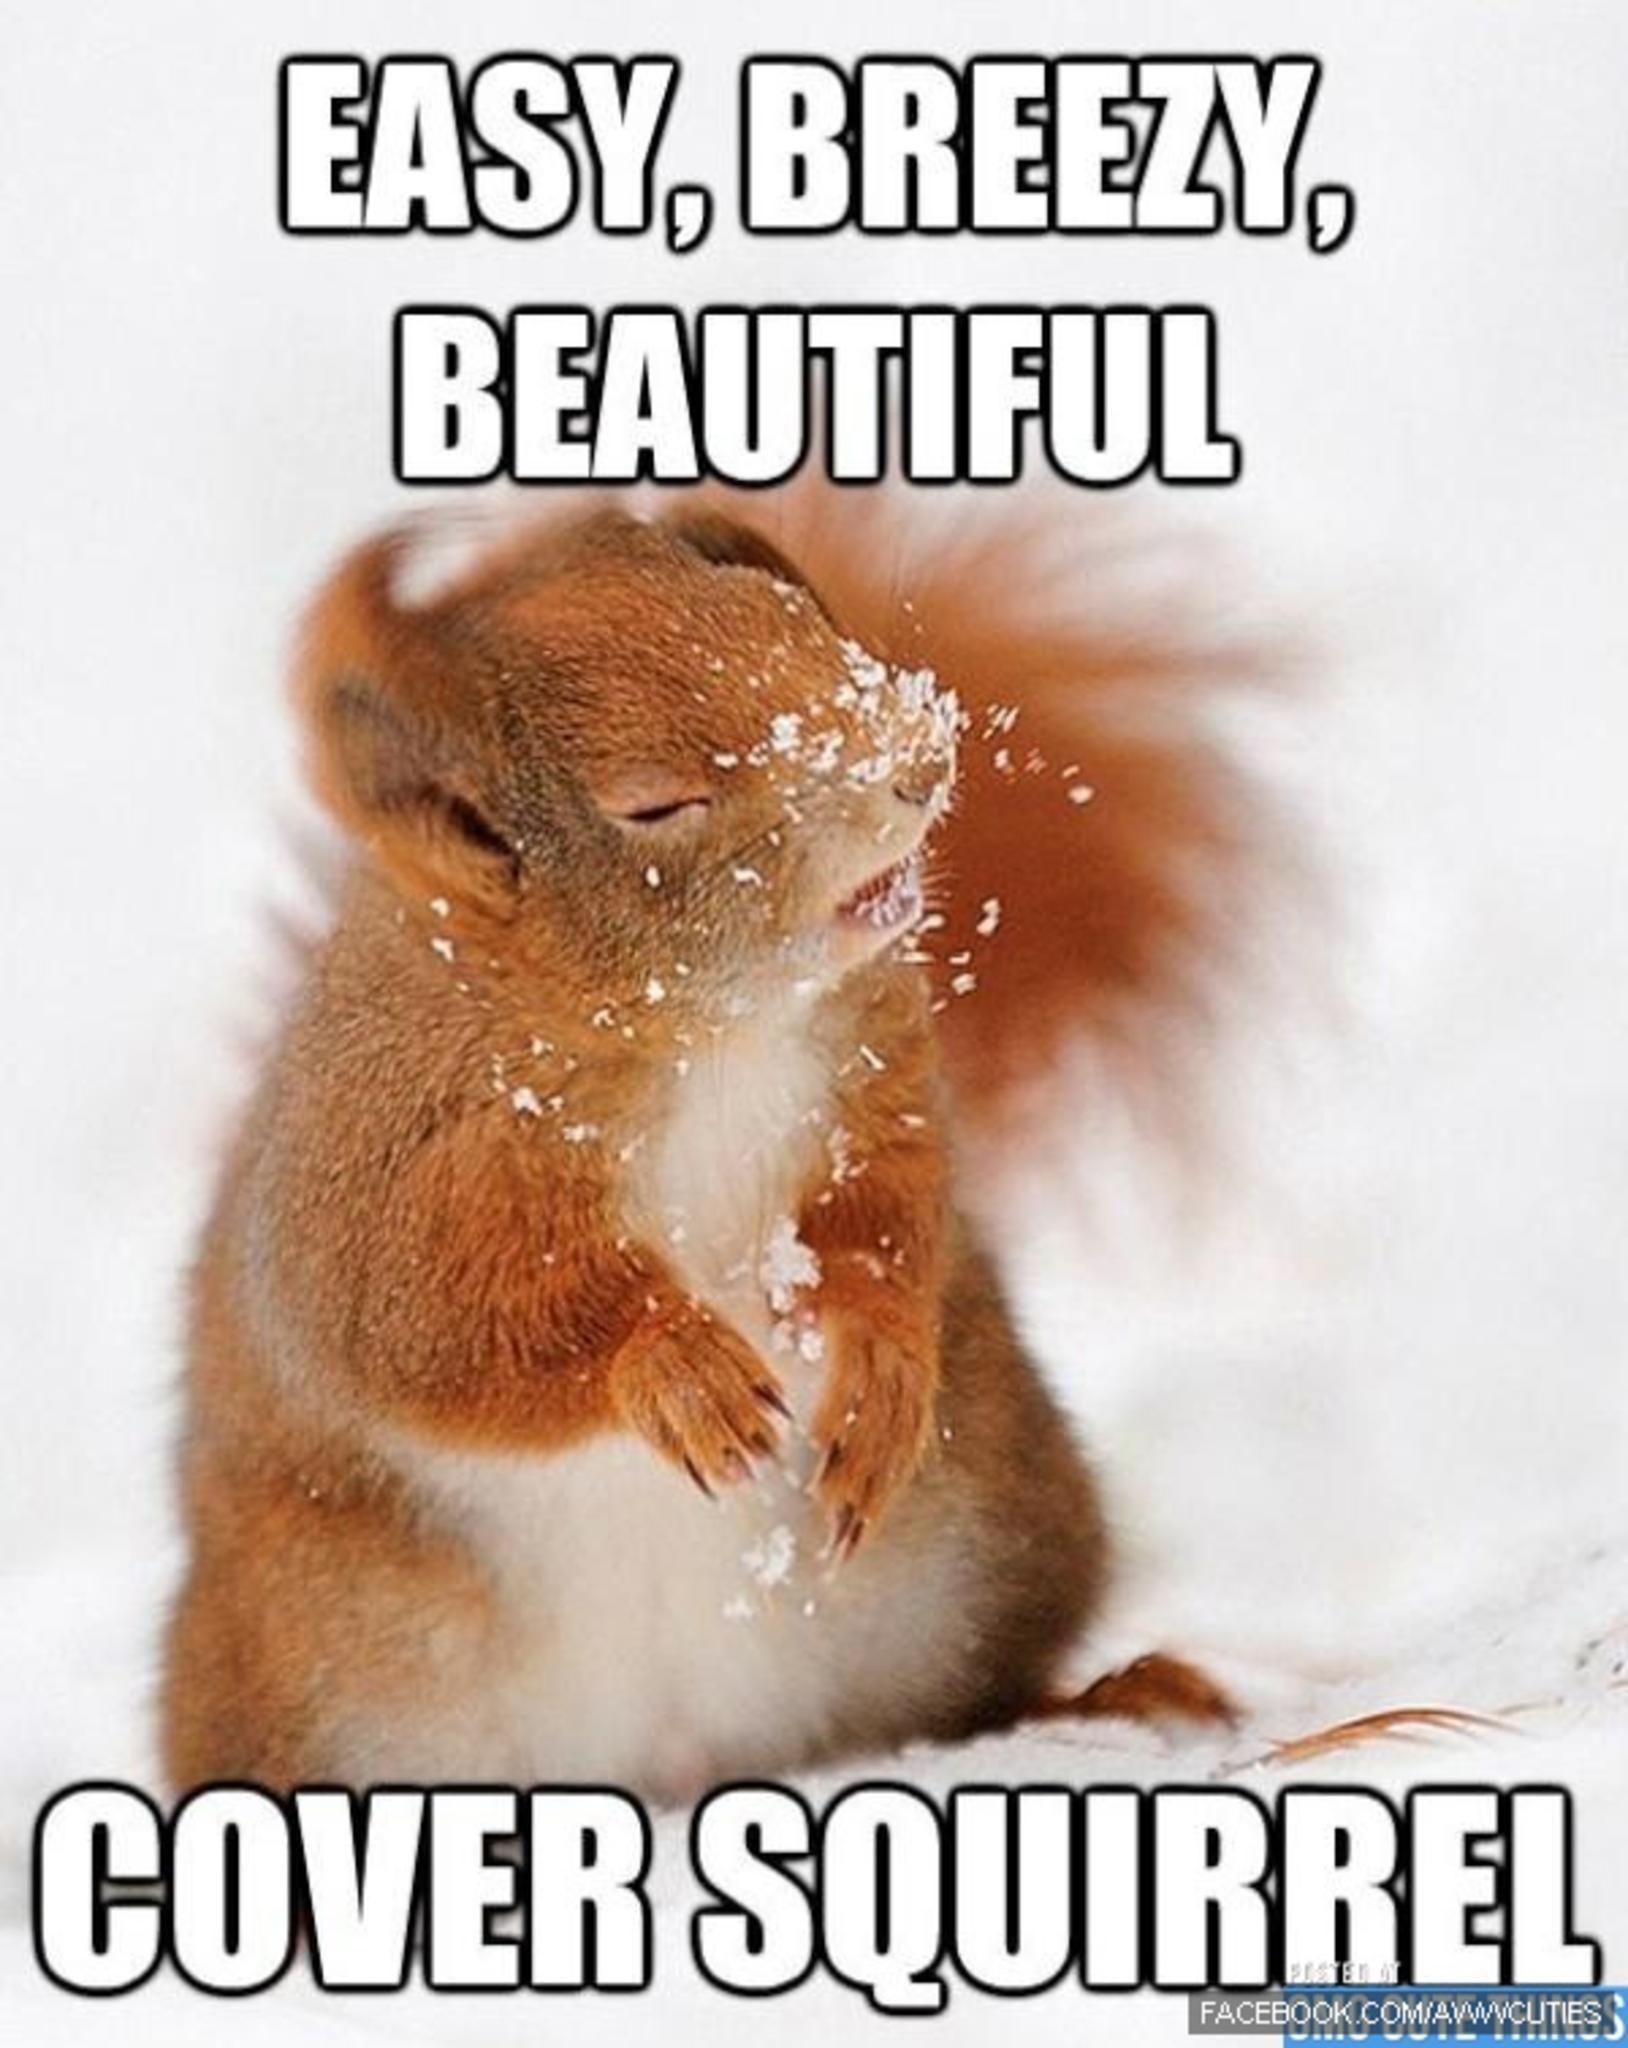 0ee53e8023c532c24ba56cd1dd1ce310 easy, breezy, beautiful cover squirel cover girl meme parody